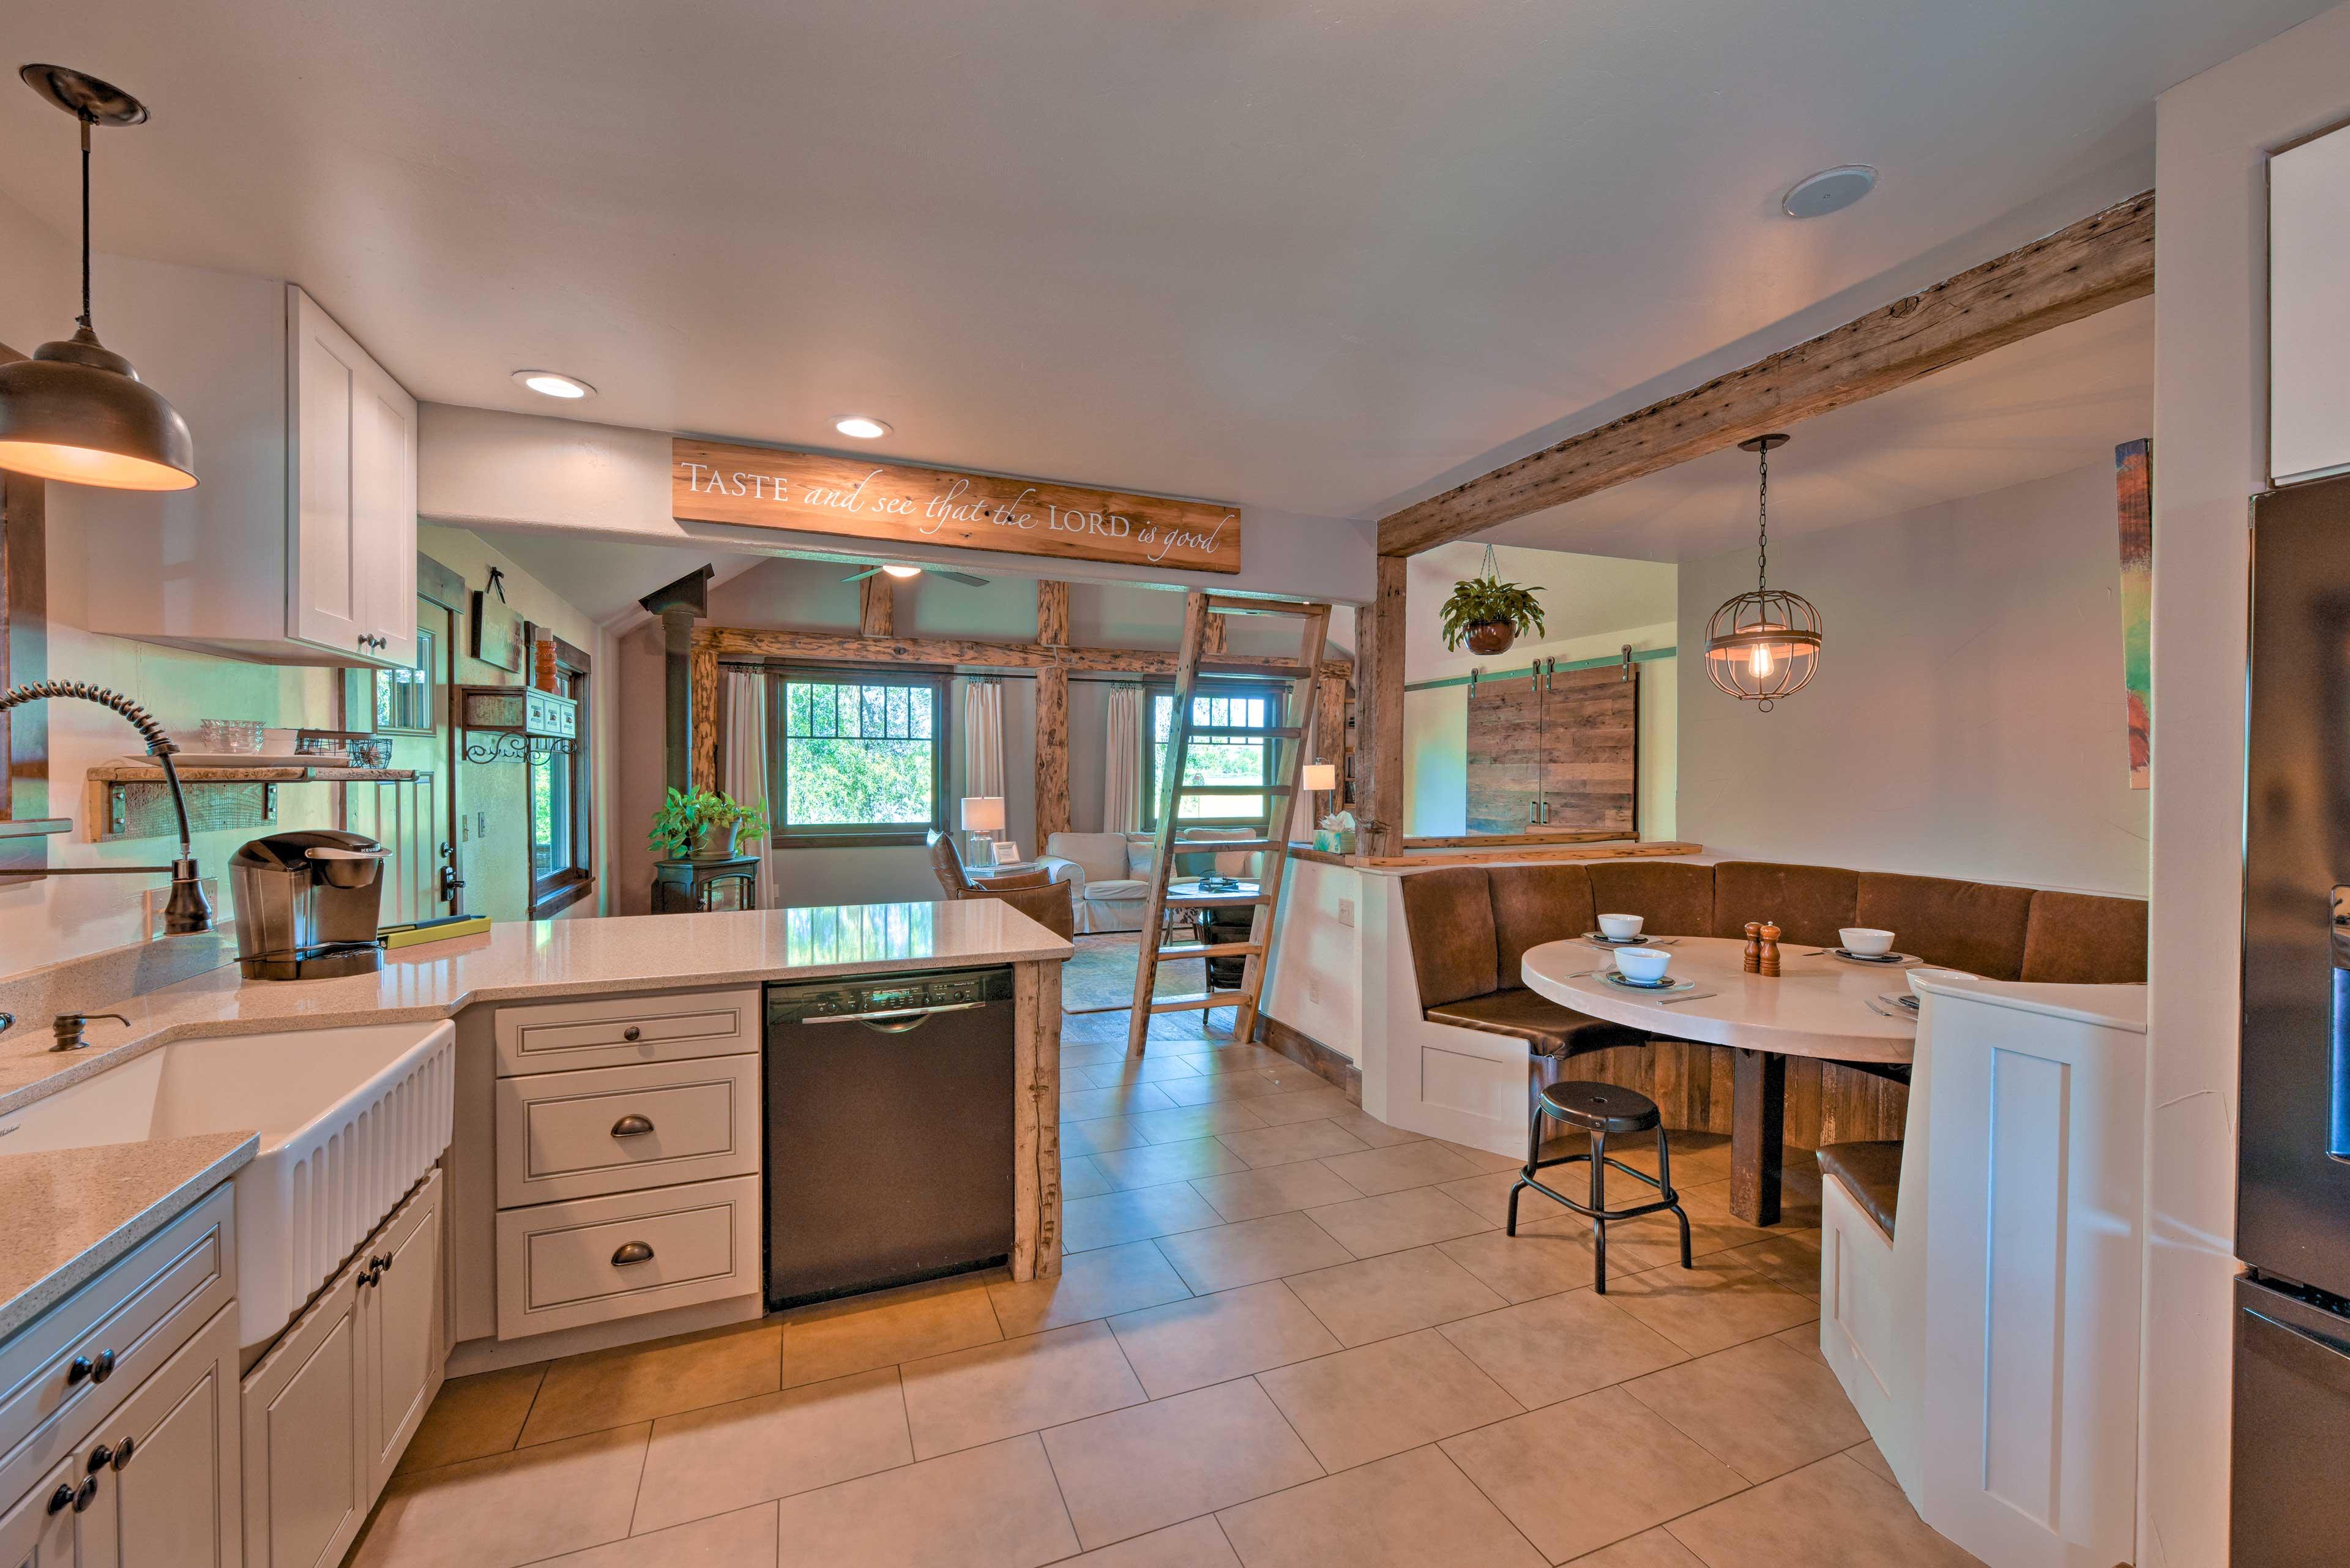 Full Kitchen | Farmhouse Sink | Keurig Coffee Maker | Dishwasher